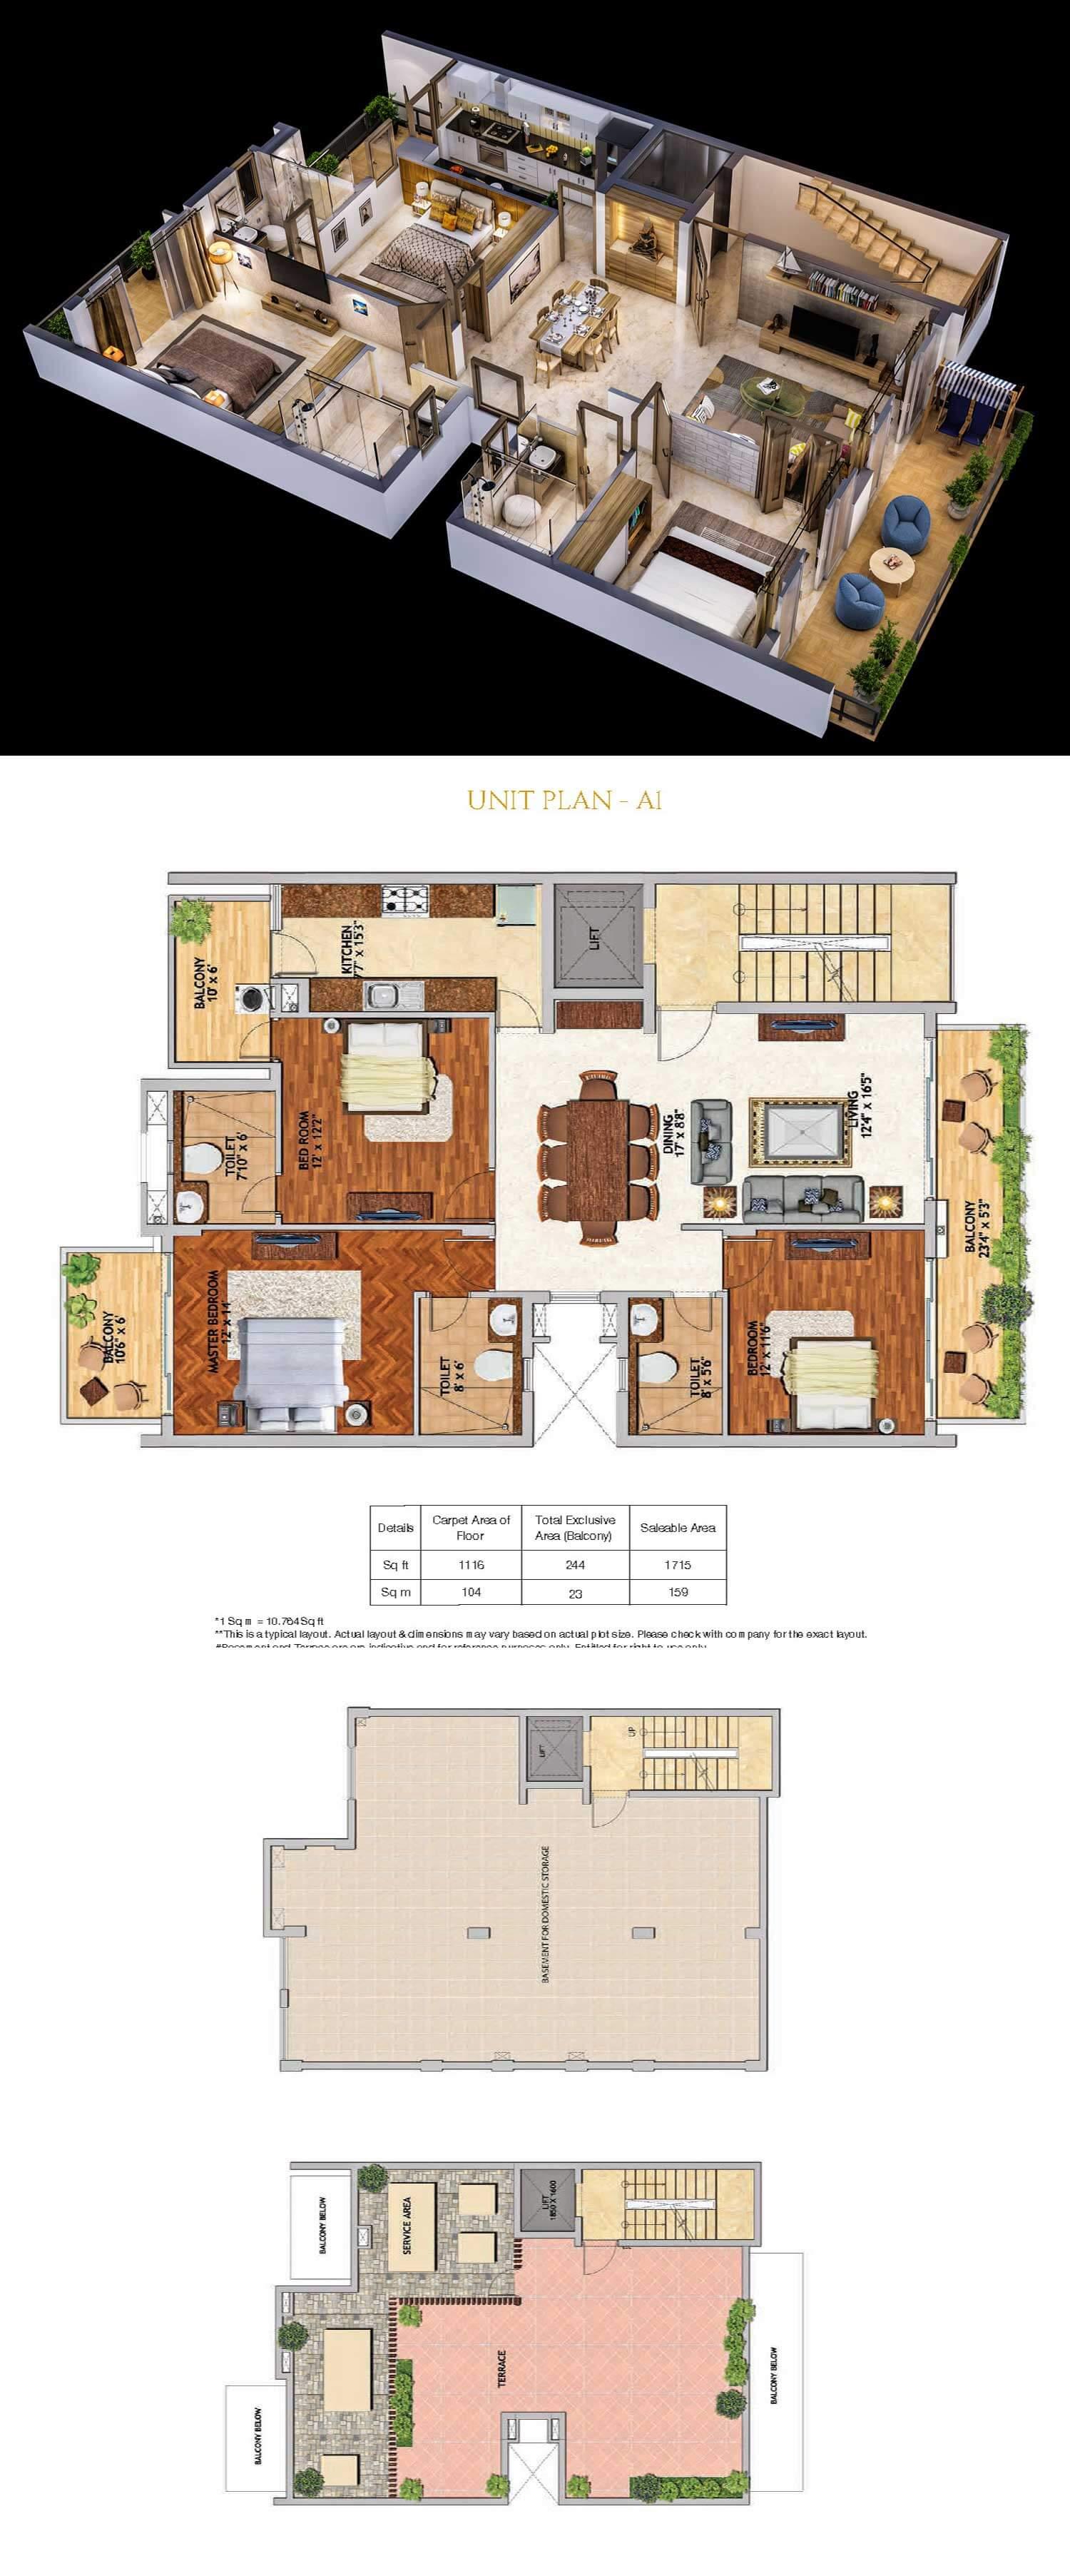 3 Bhk 1116 Sq Ft Villa For Sale In Adani Samsara At Rs 1 70 Cr Gurgaon